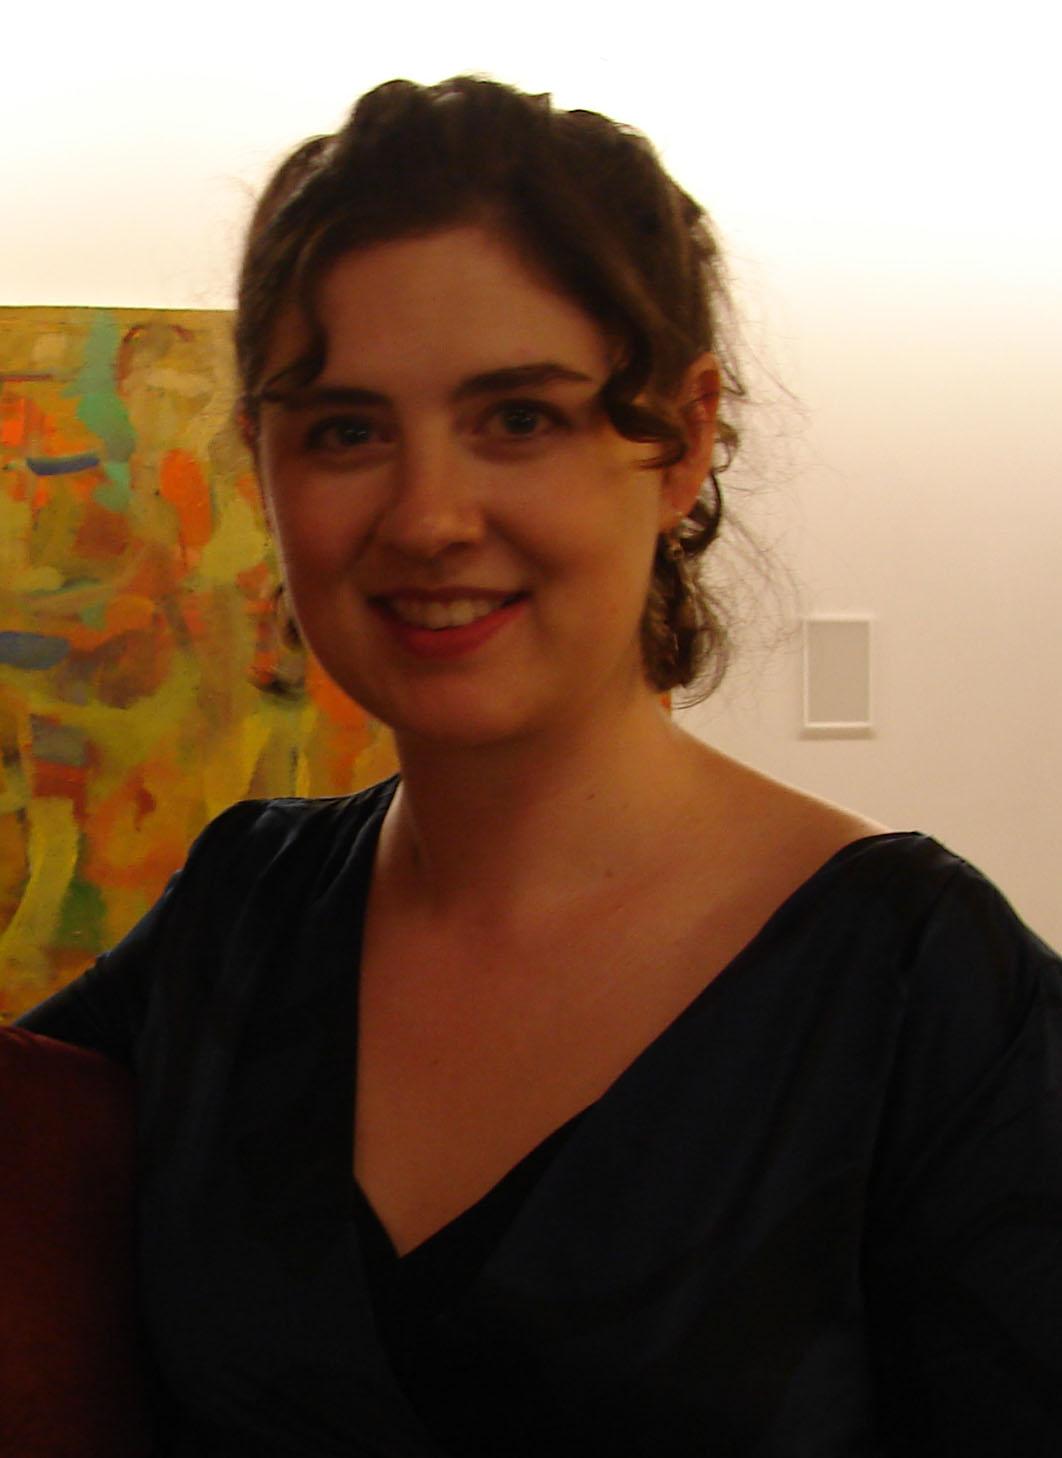 Natasha Overholtzer